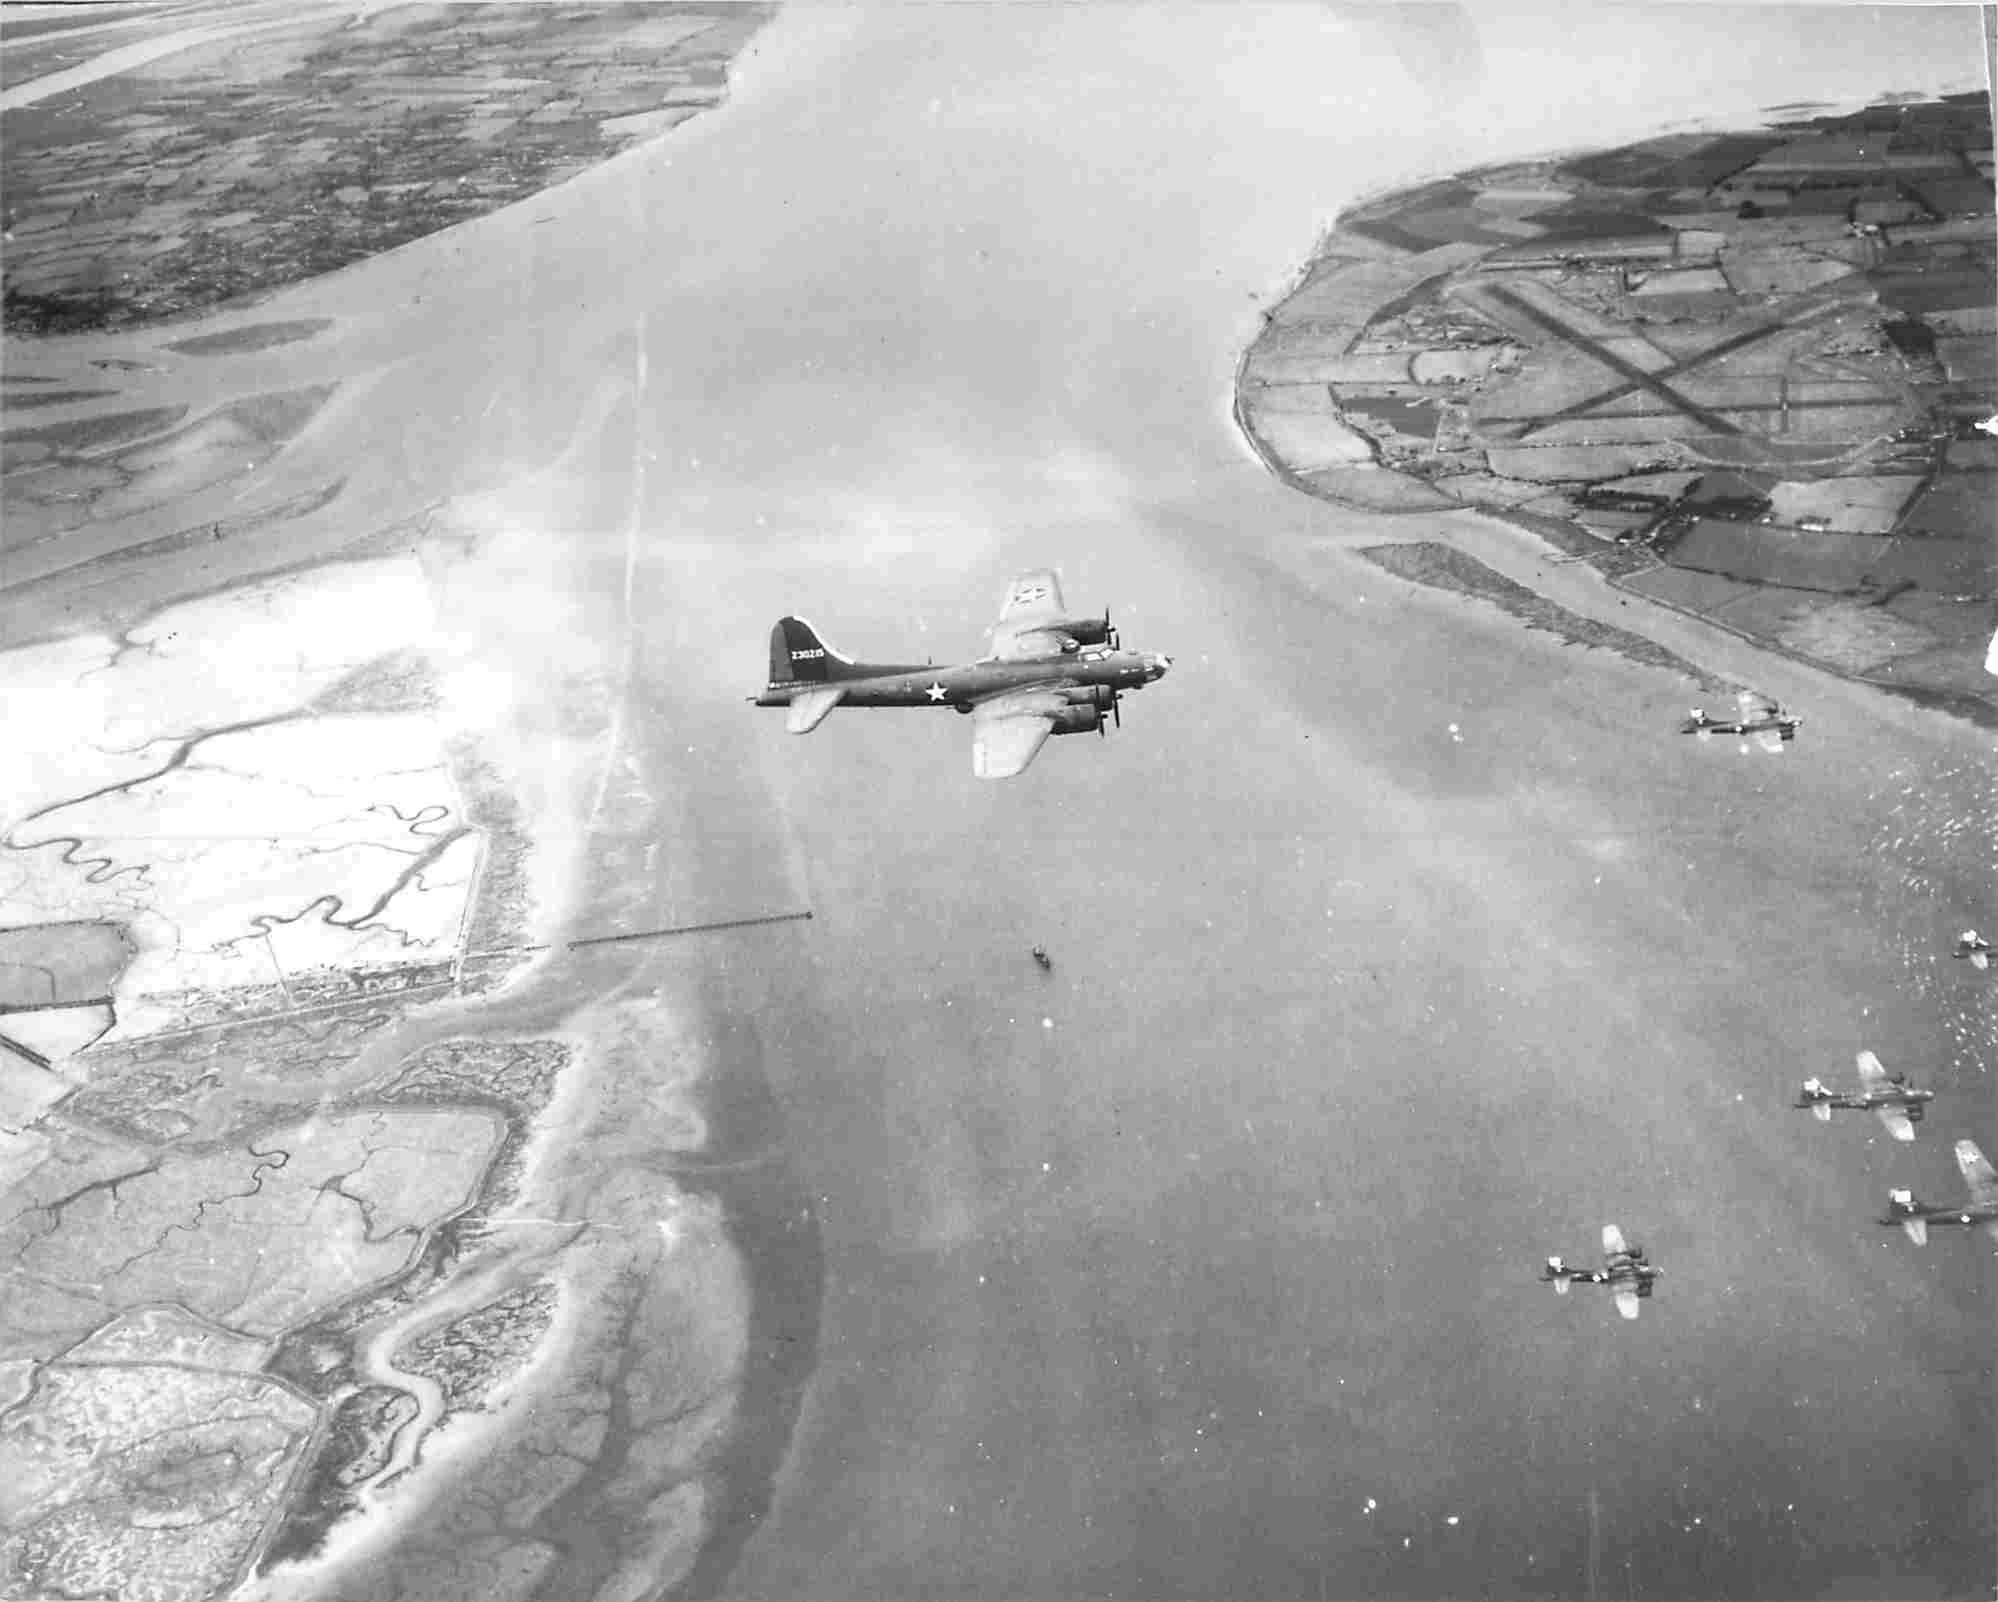 B-17 #42-30215 / Gremlin Gus aka Slightly Dangerous II